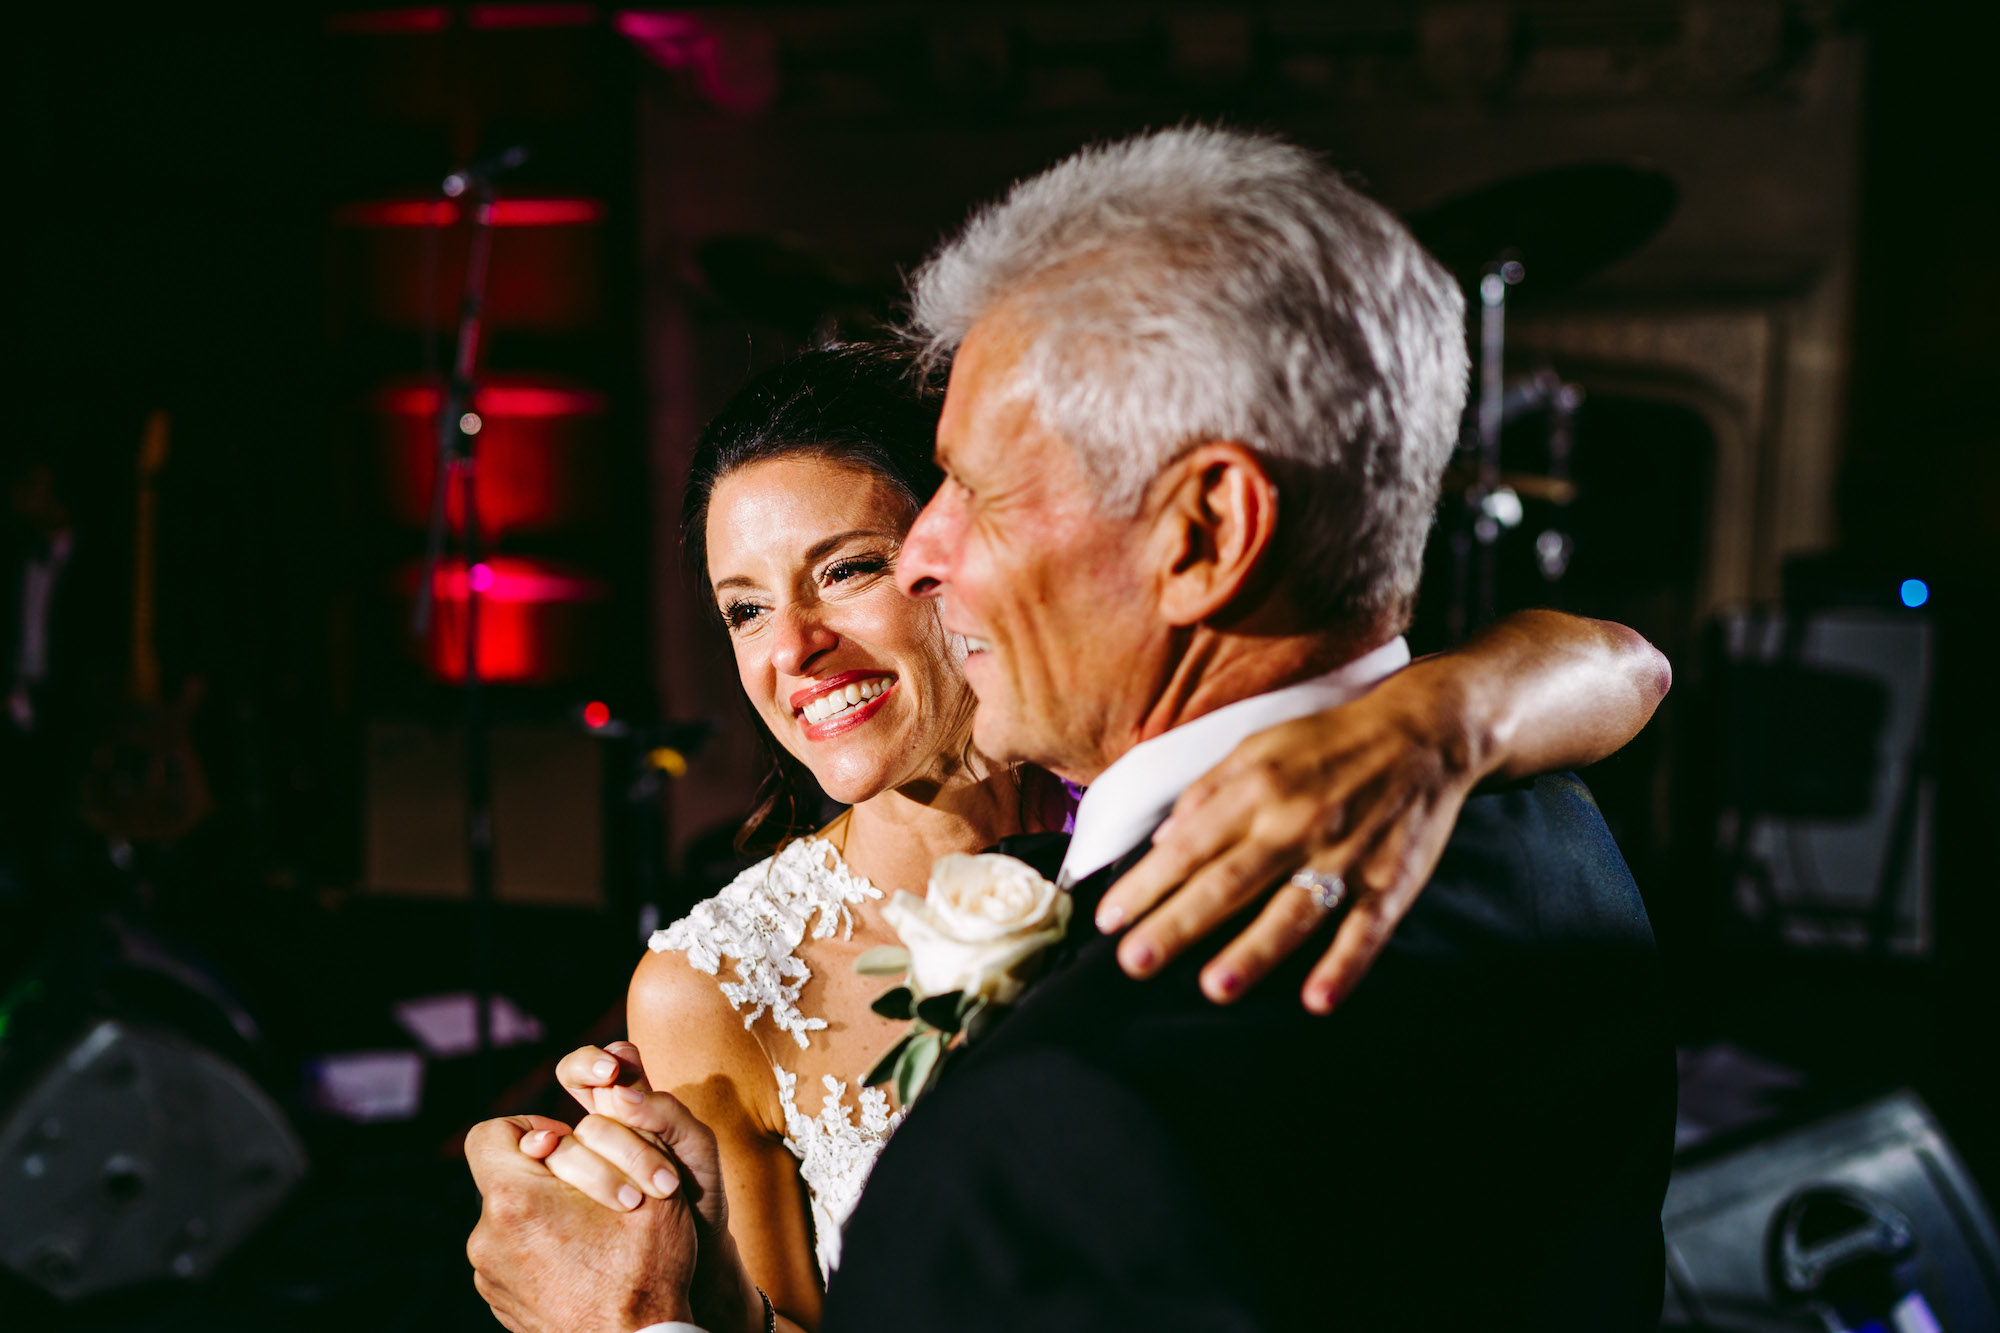 100   Hengrave Hall Wedding   Suffolk Wedding   Lamare London   Luxury Wedding Planner   Jon Mold Photography.jpg